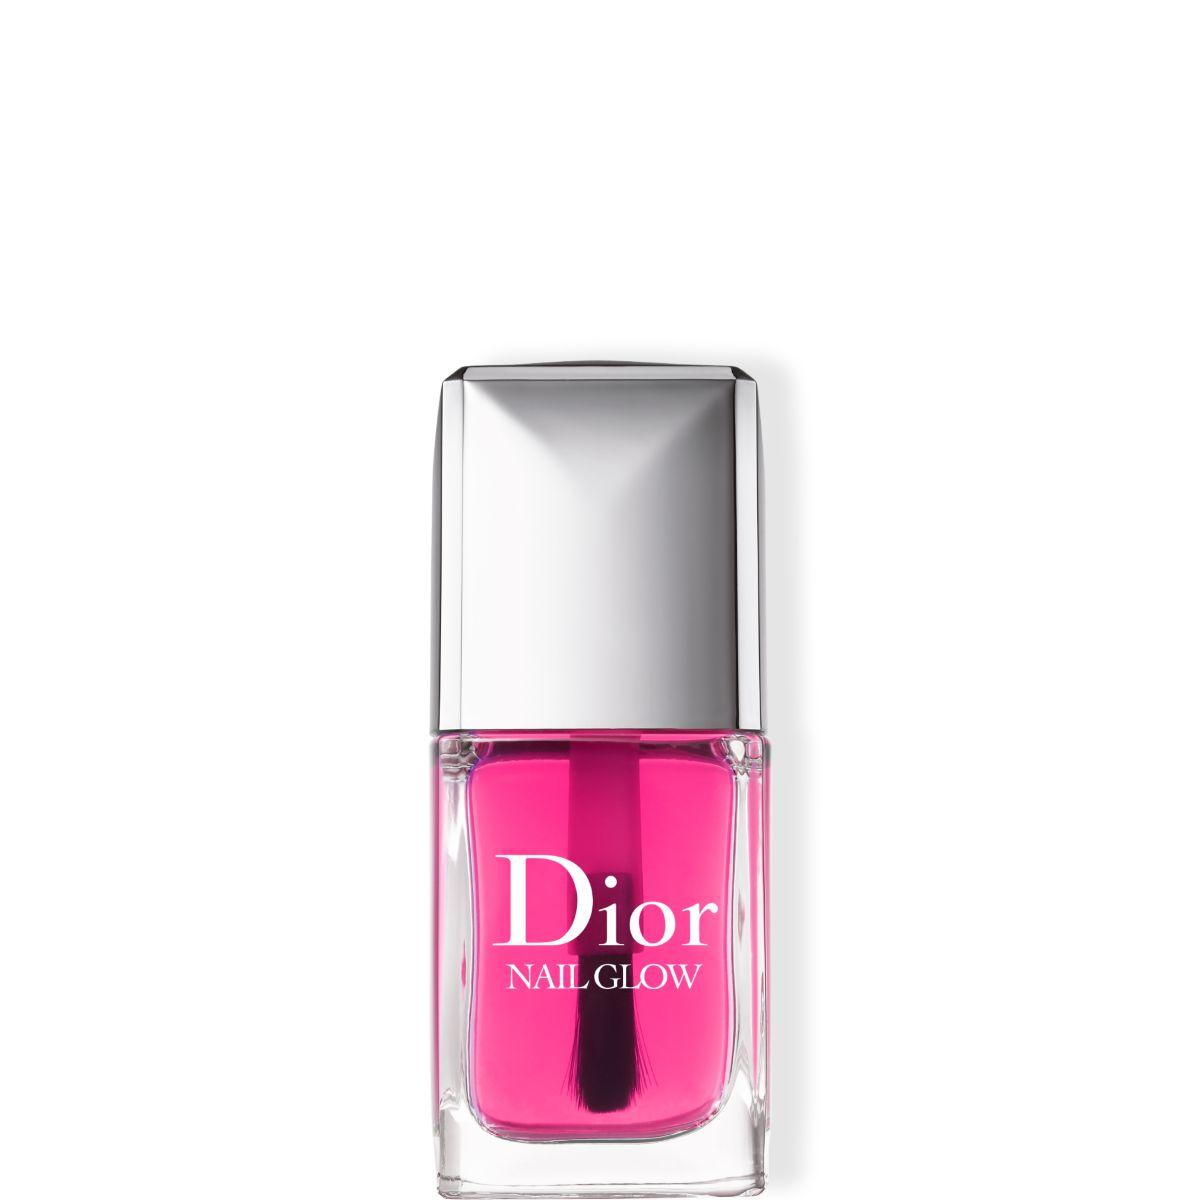 Dior - Nail Glow - Effet French Manucure Instantanée, soin éclaircissant